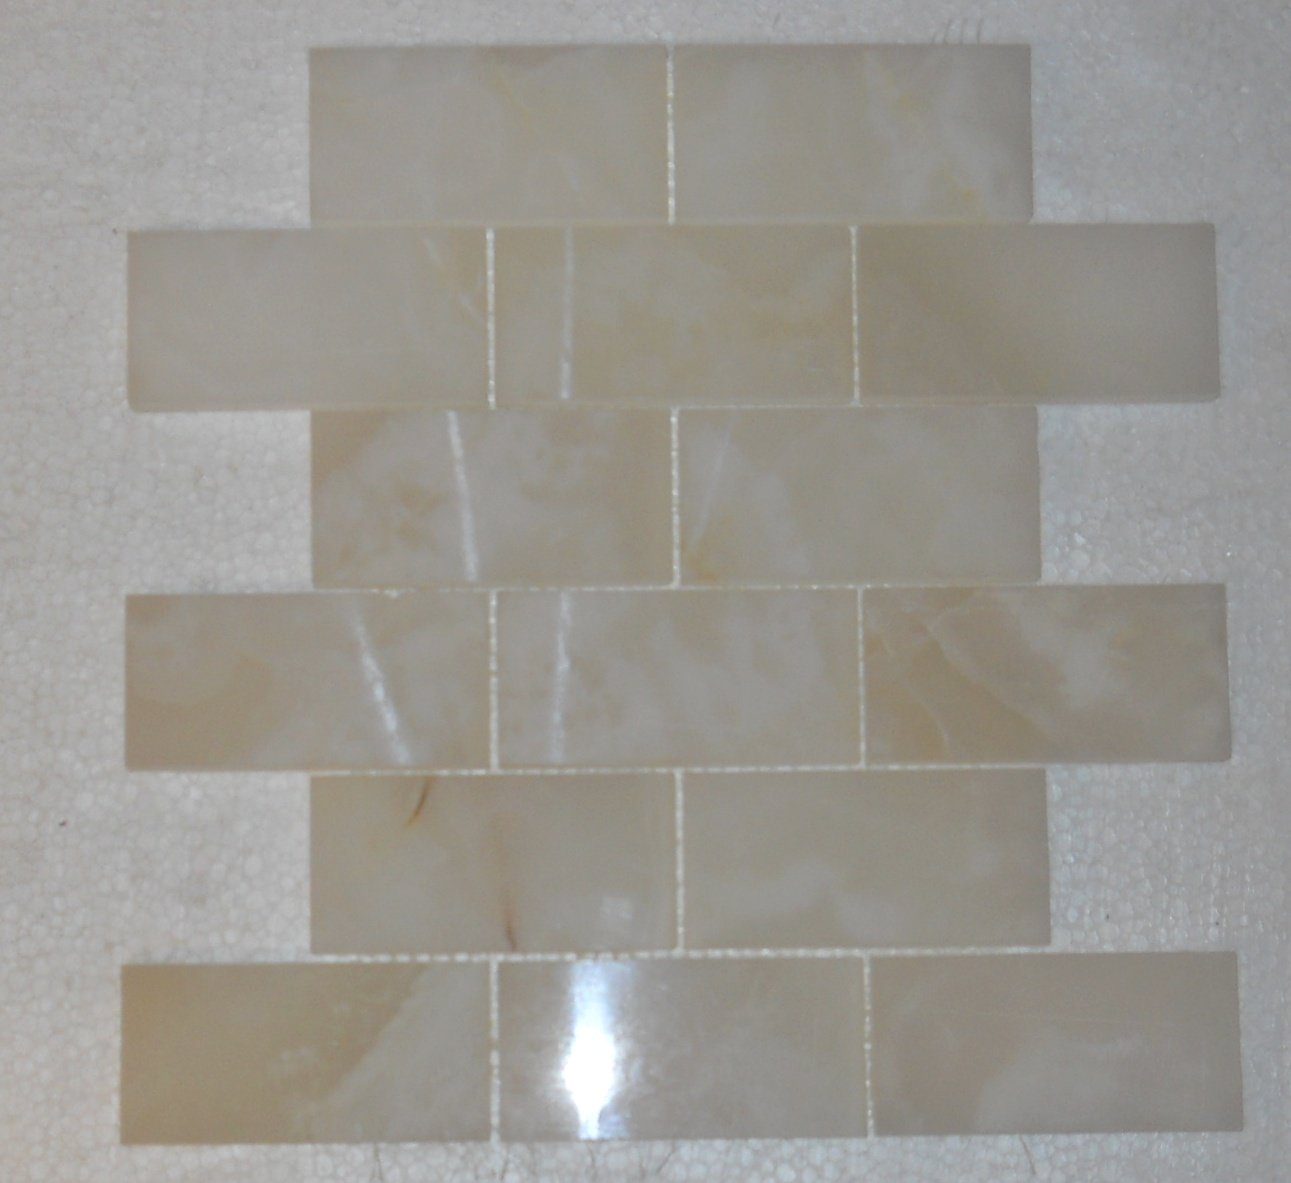 Premium White Onyx Vein Cut 2 X 4 Polished Brick Mosaic Tile